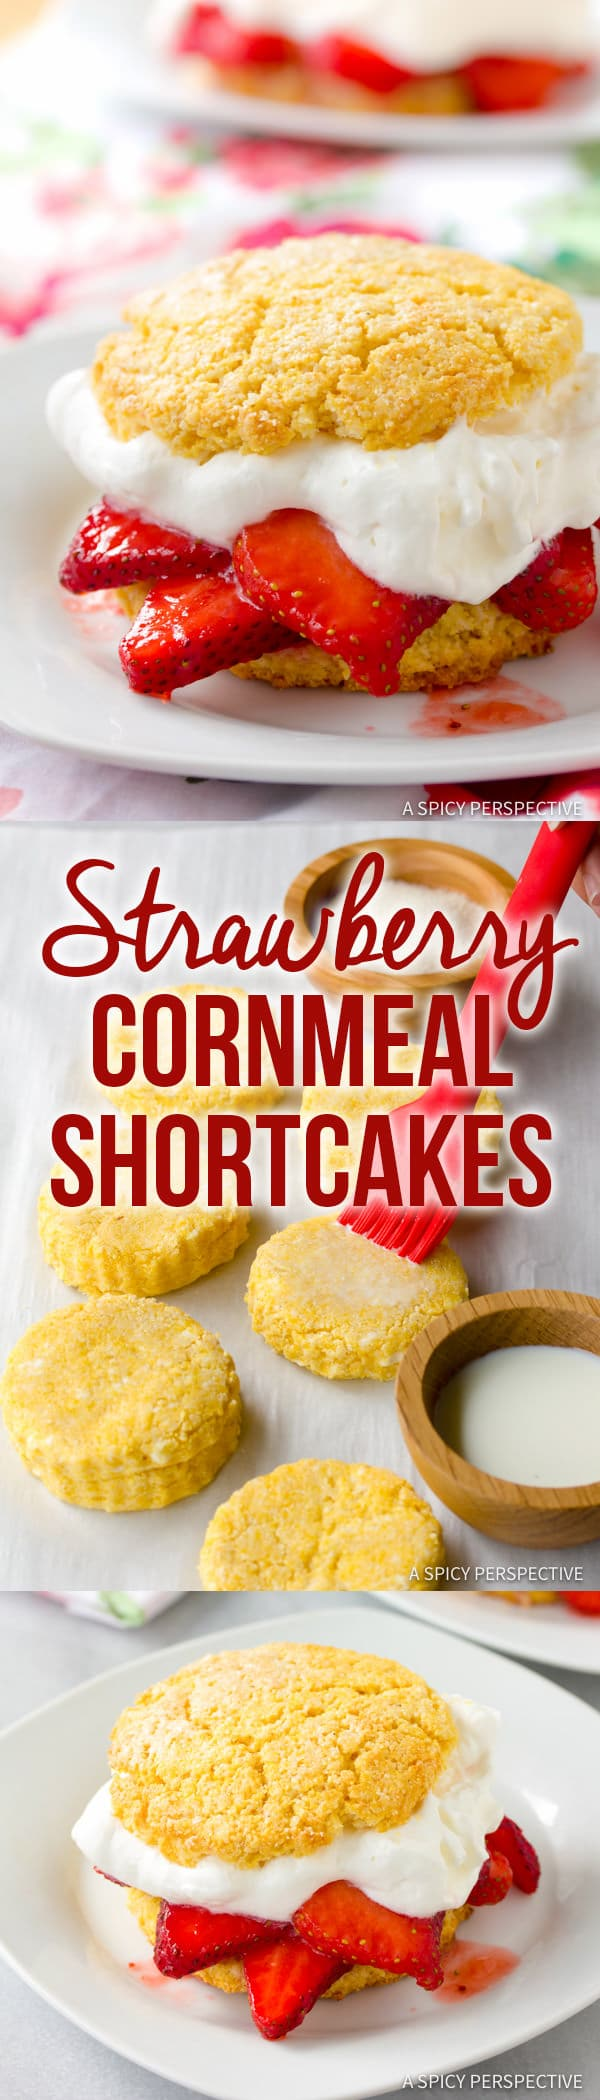 Fresh Rustic Strawberry Shortcakes Recipe | ASpicyPerspective.com